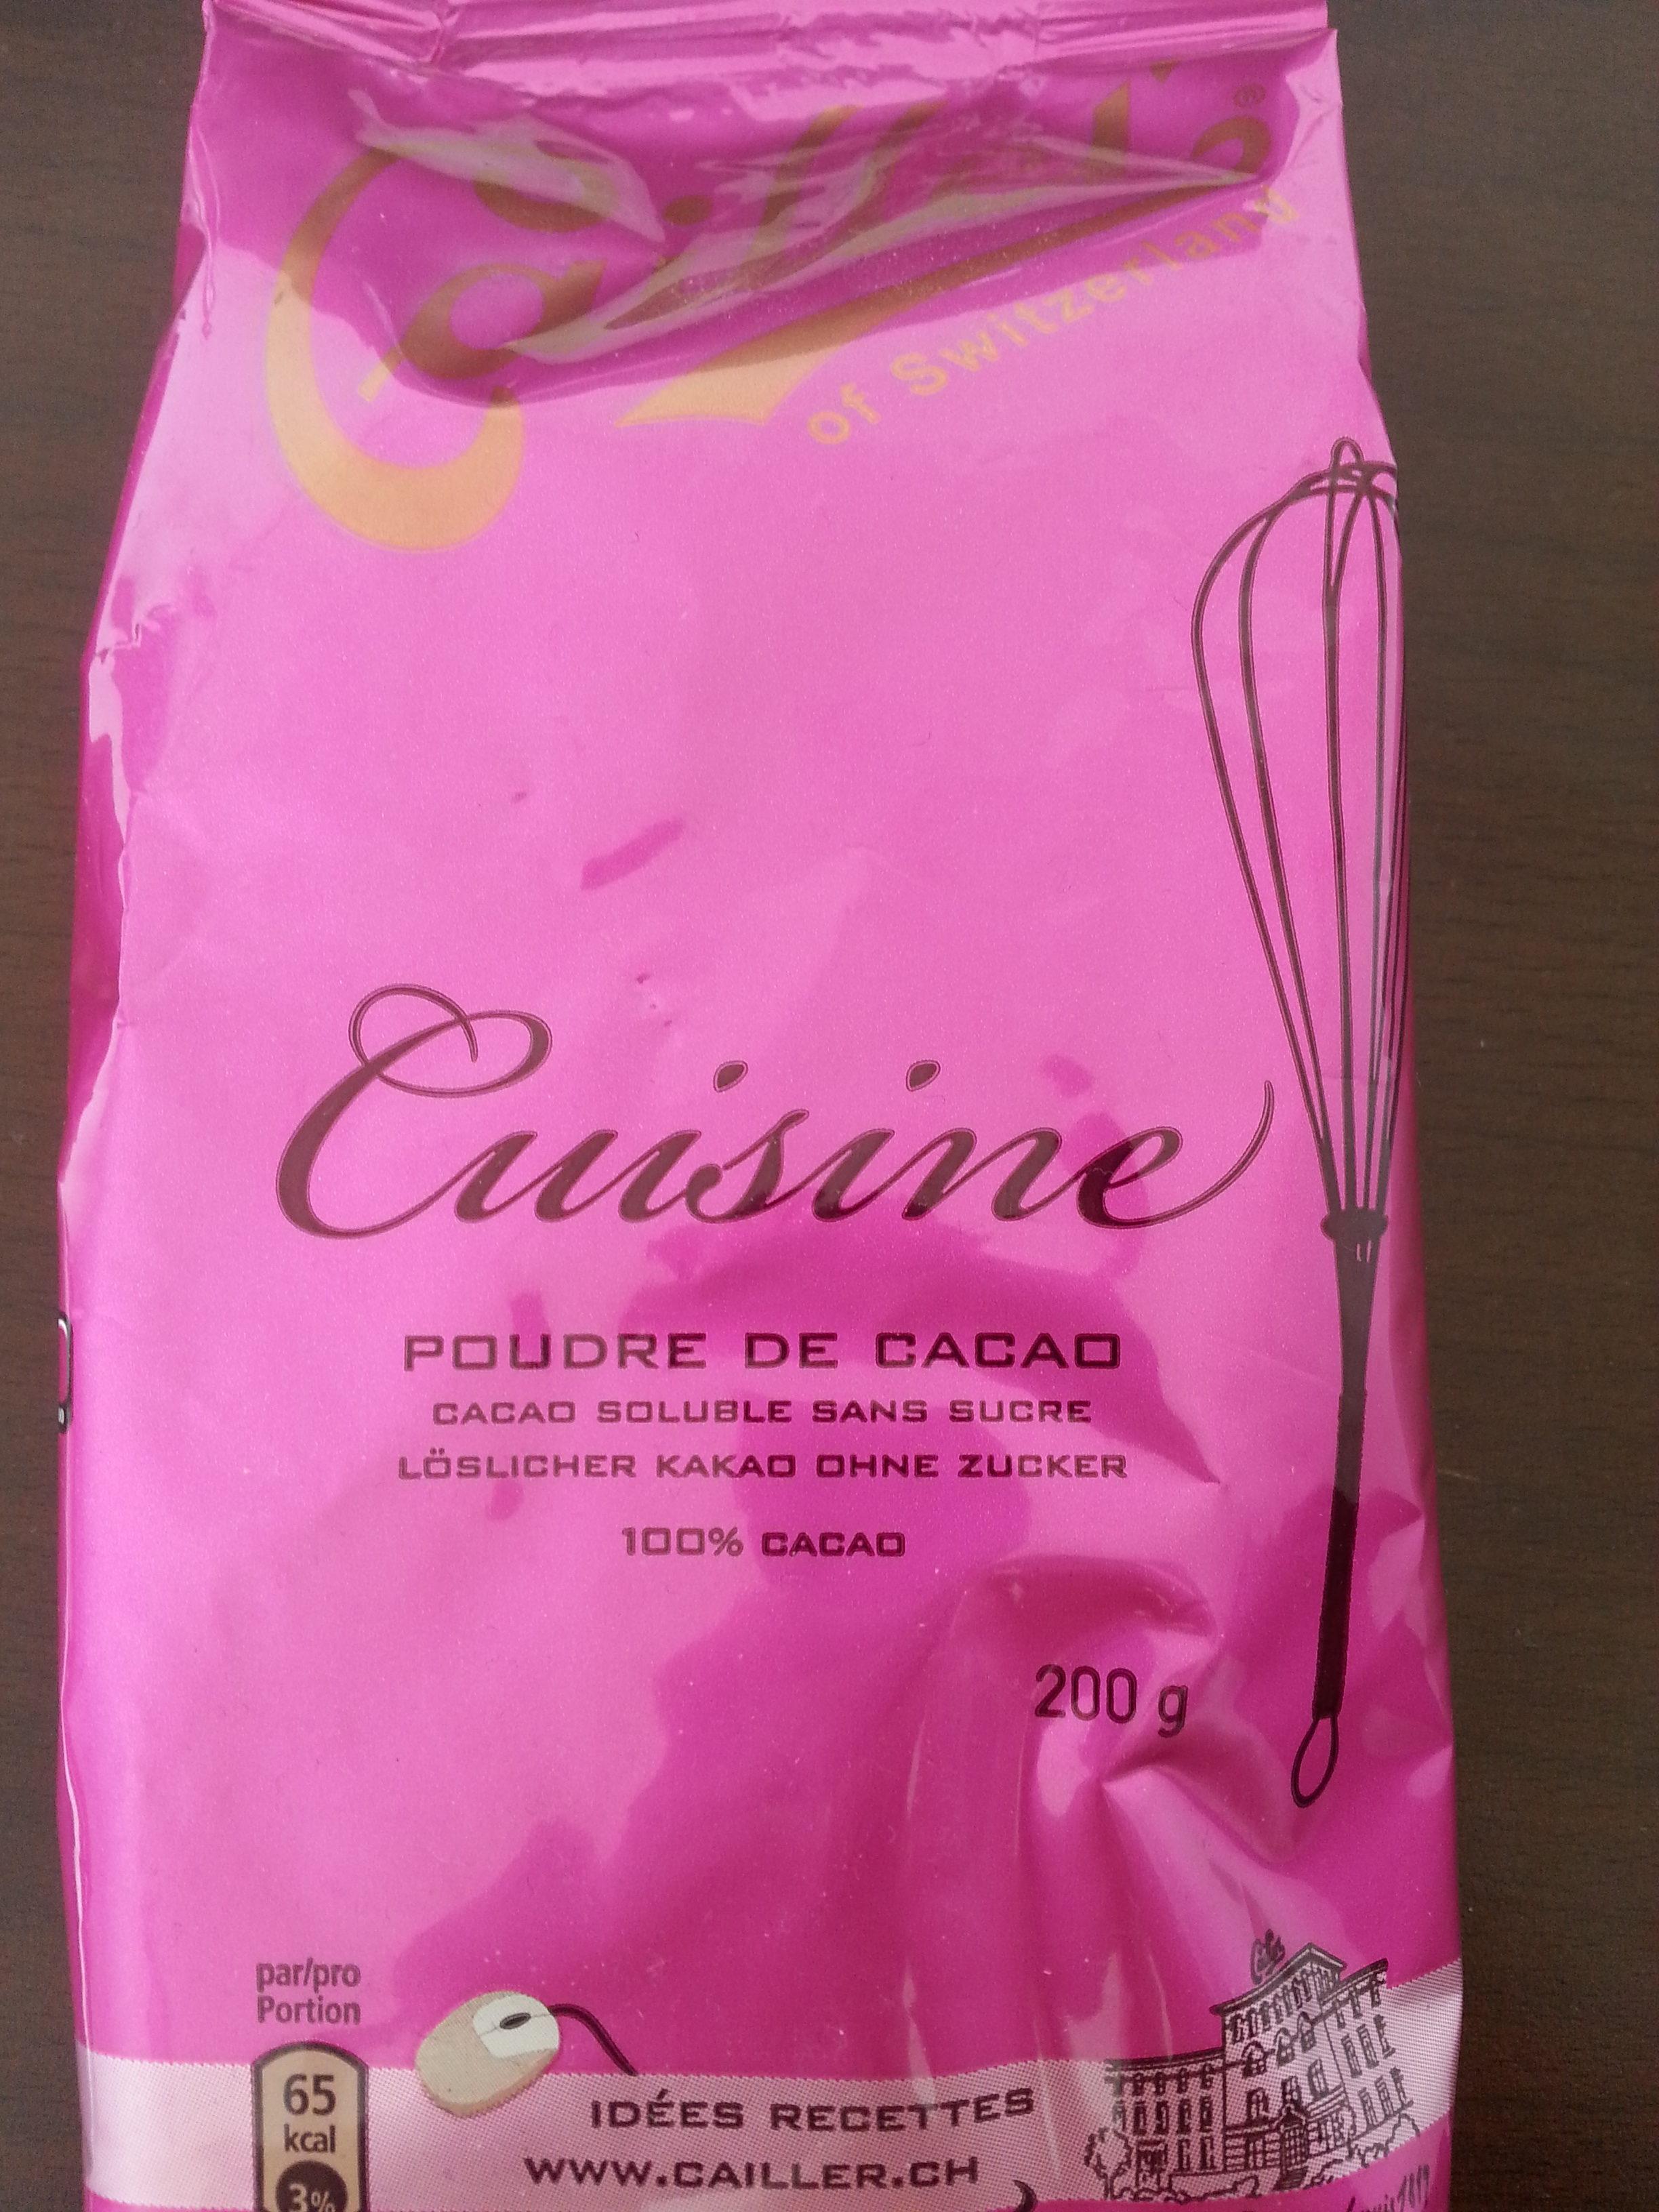 Poudre de cacao - Prodotto - fr